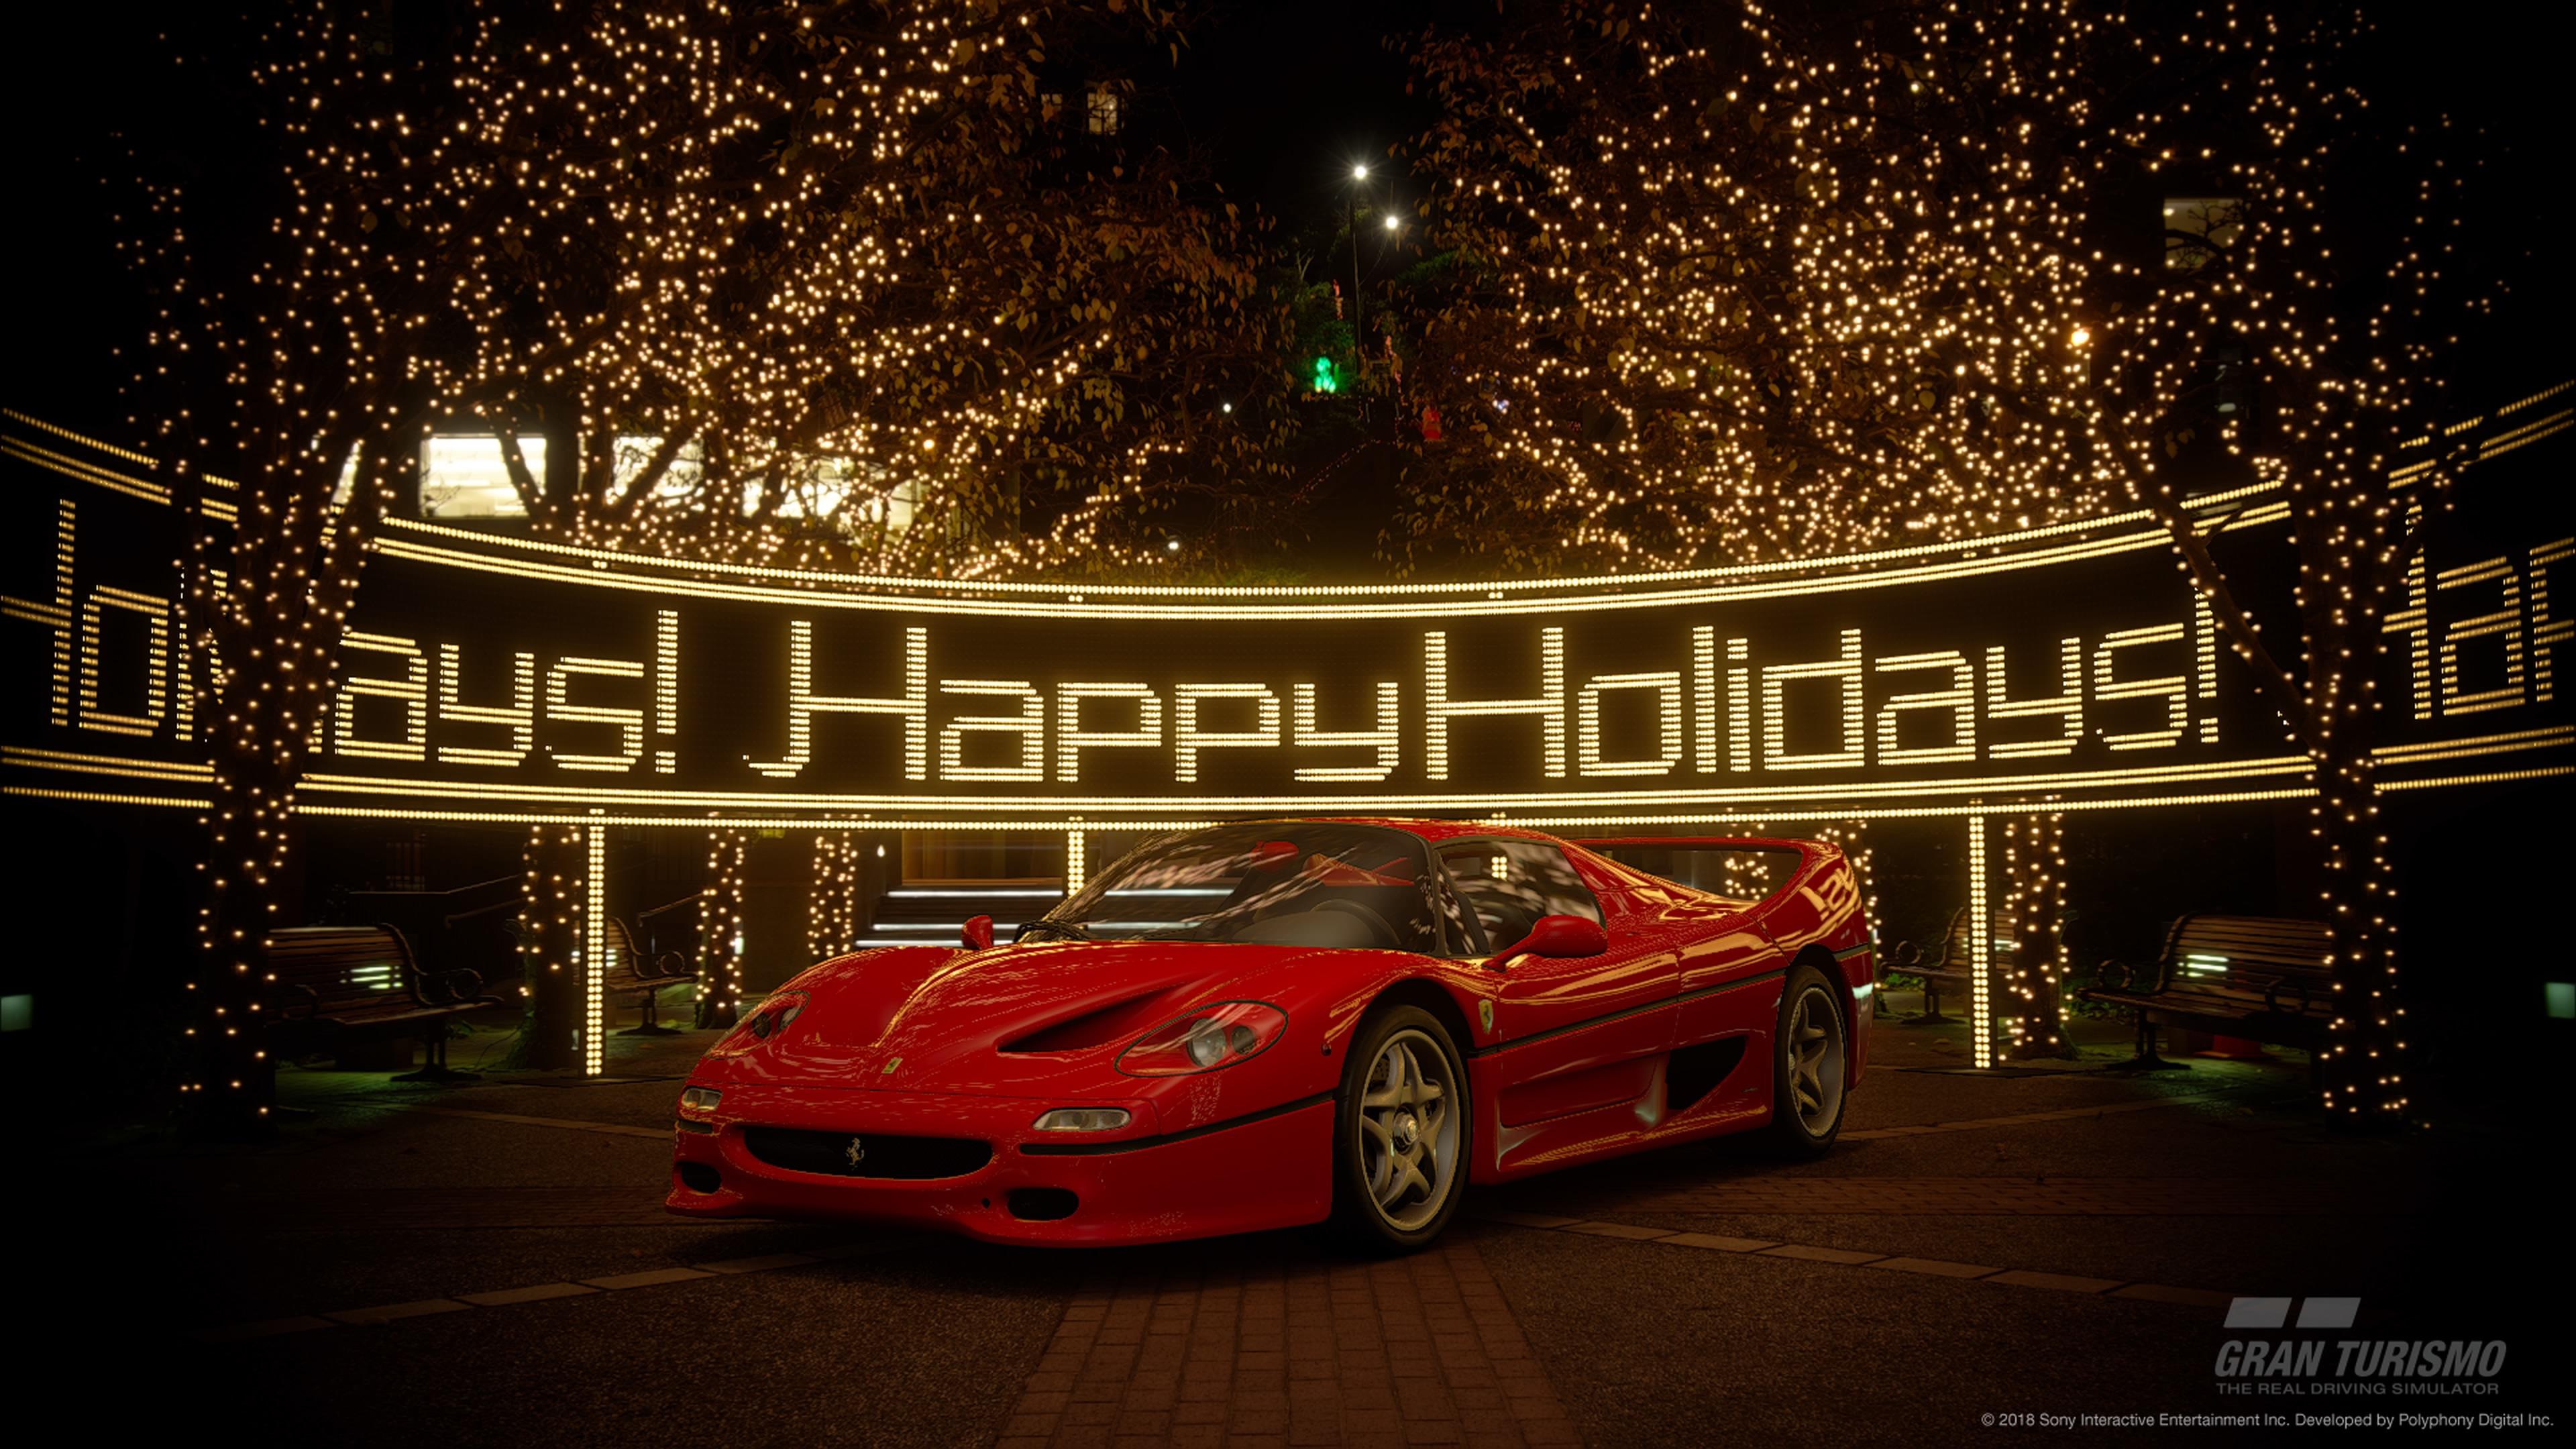 Gran-Turismo-SPORT-20181206224736.jpg